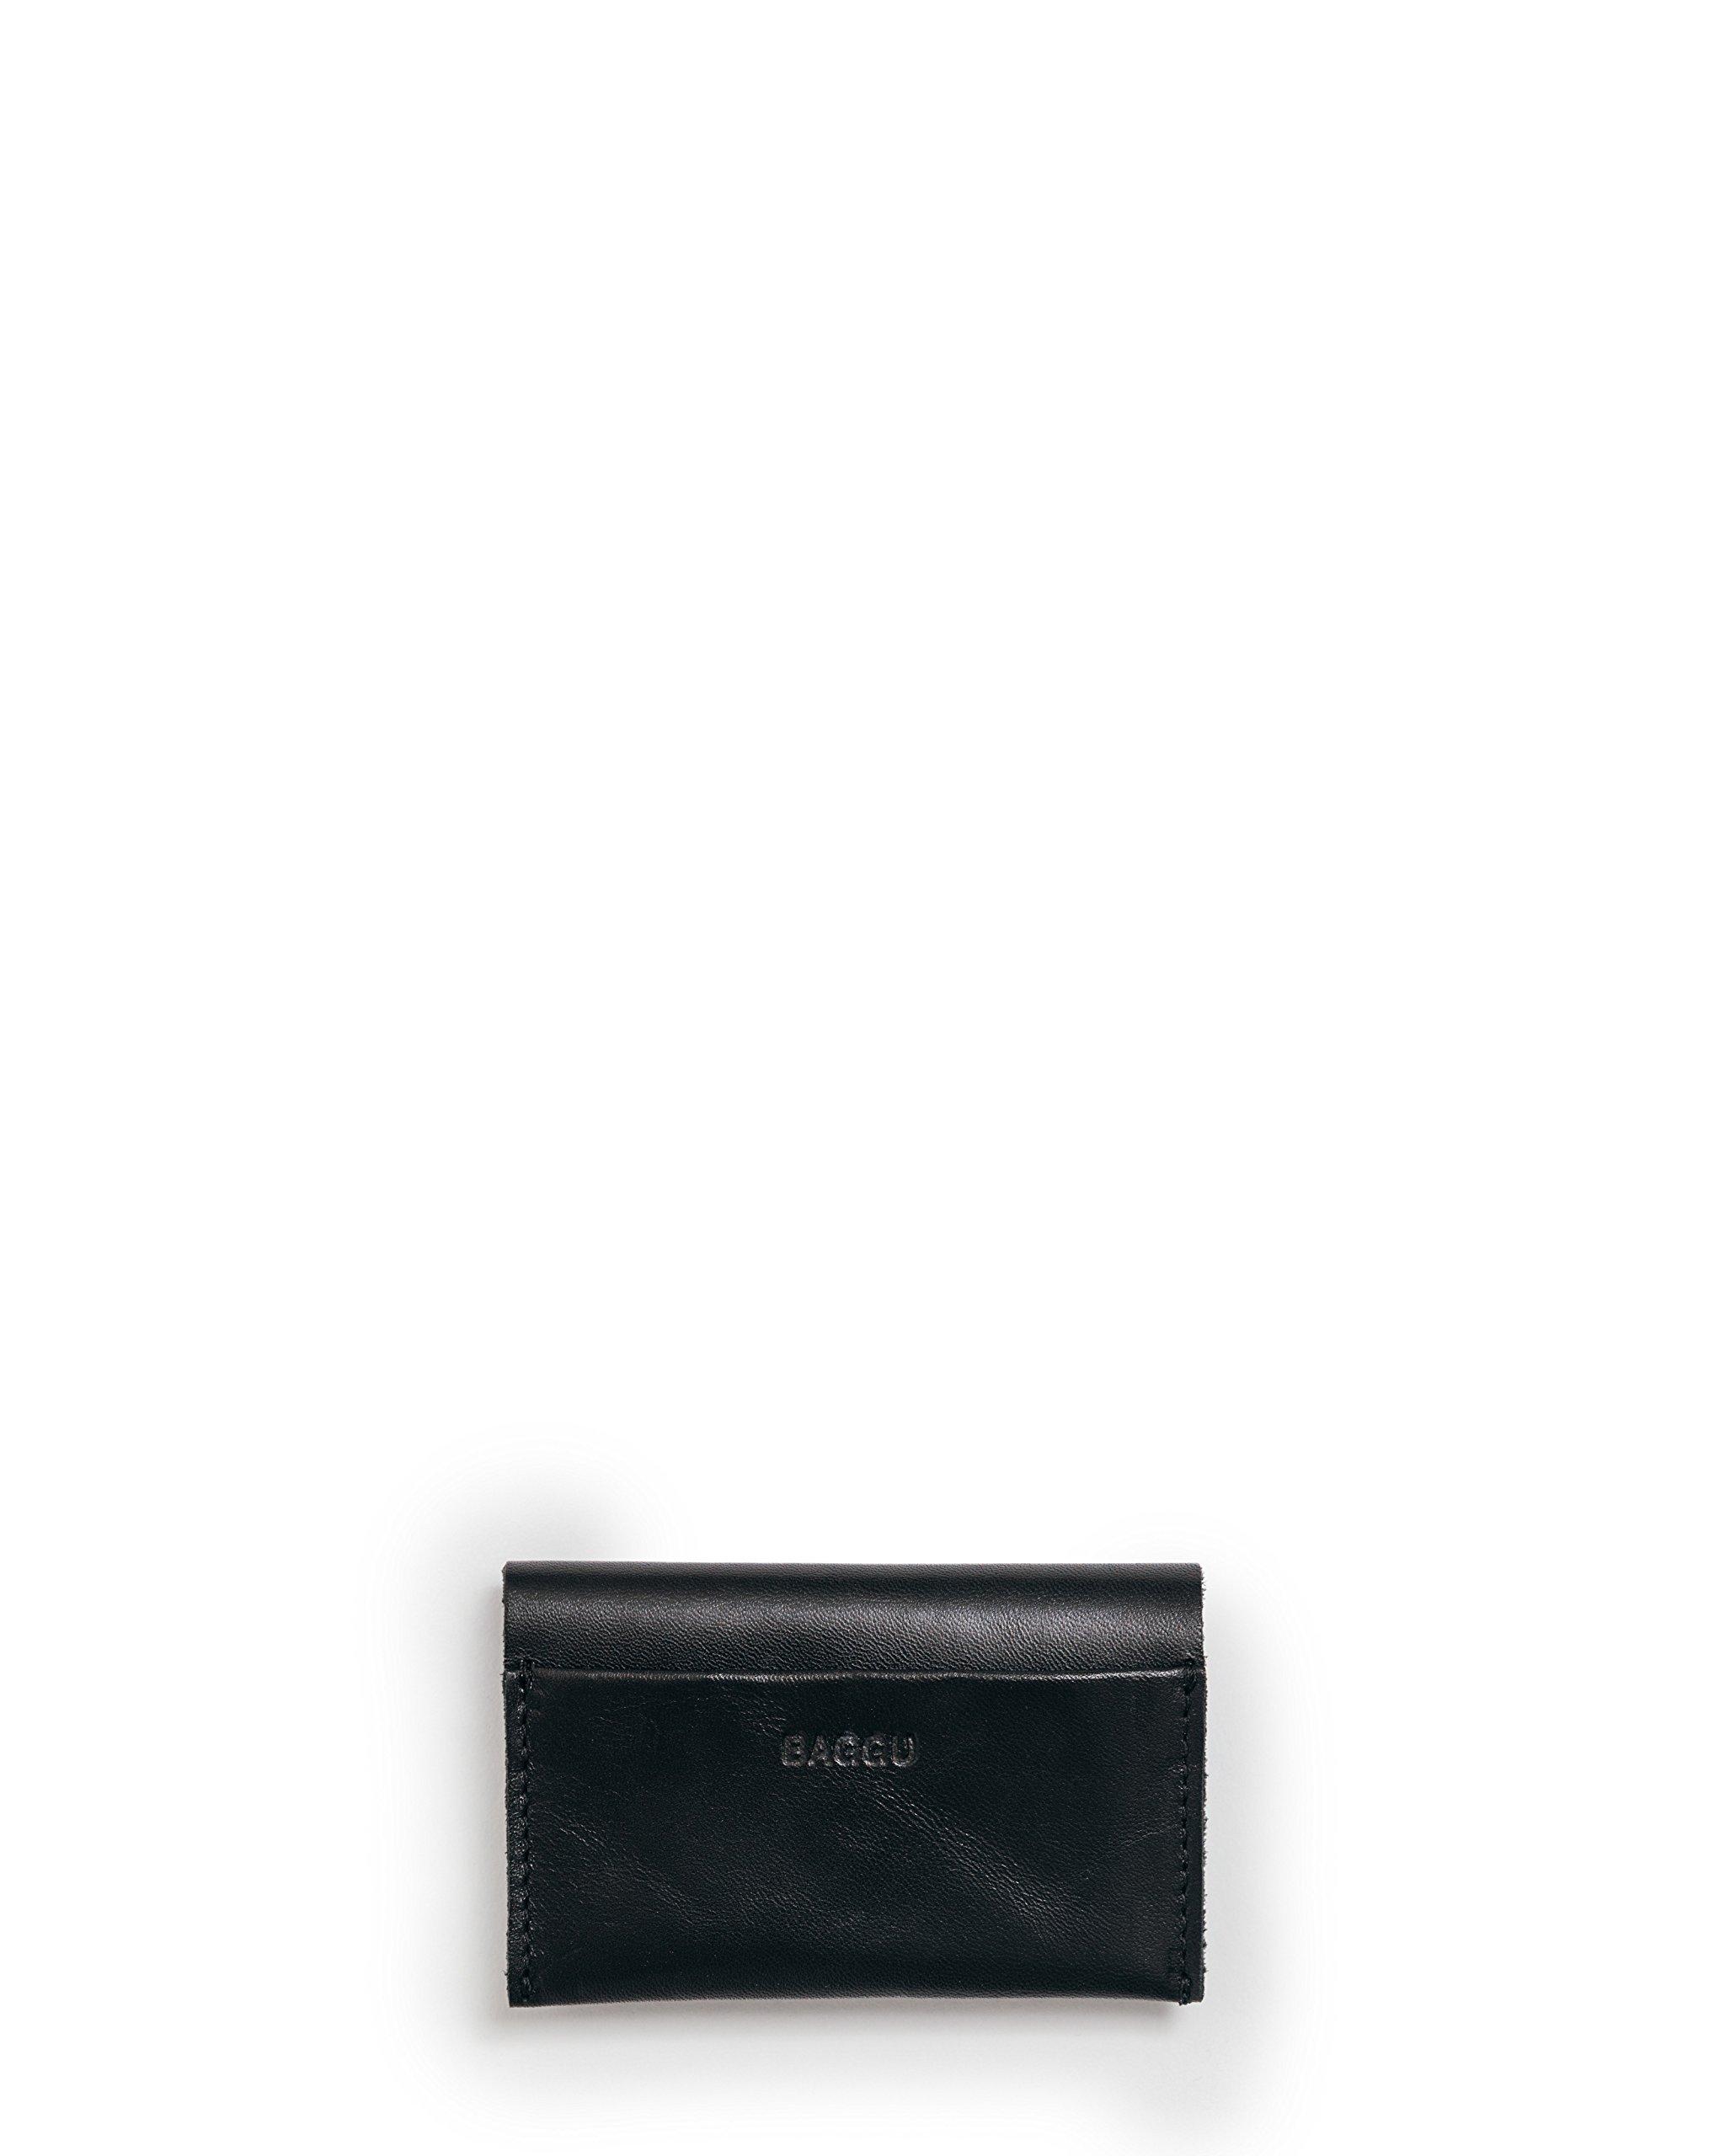 BAGGU Card Holder - Black